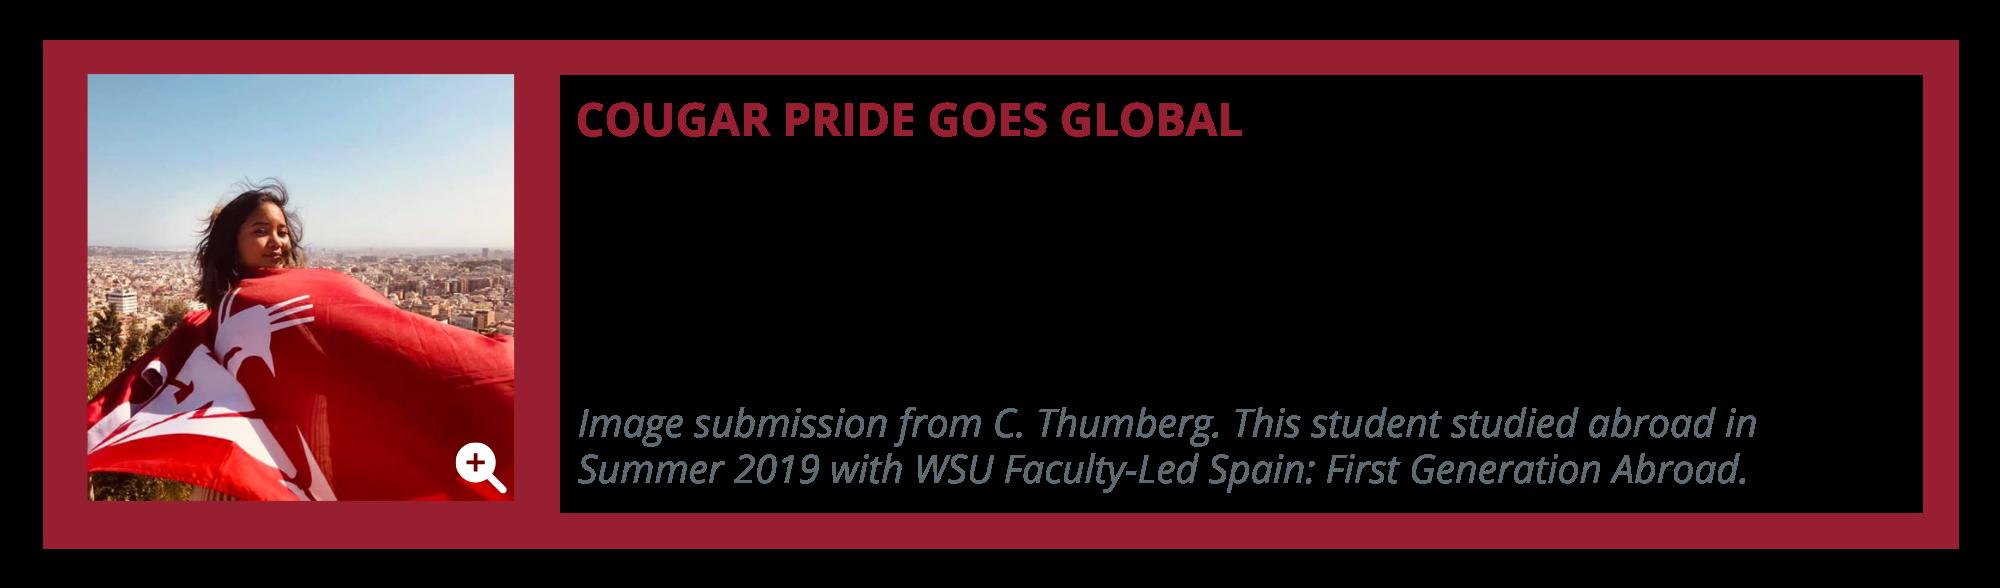 Wsu Academic Calendar 2022 2023.Study Abroad Anyone Anytime Anywhere Washington State University